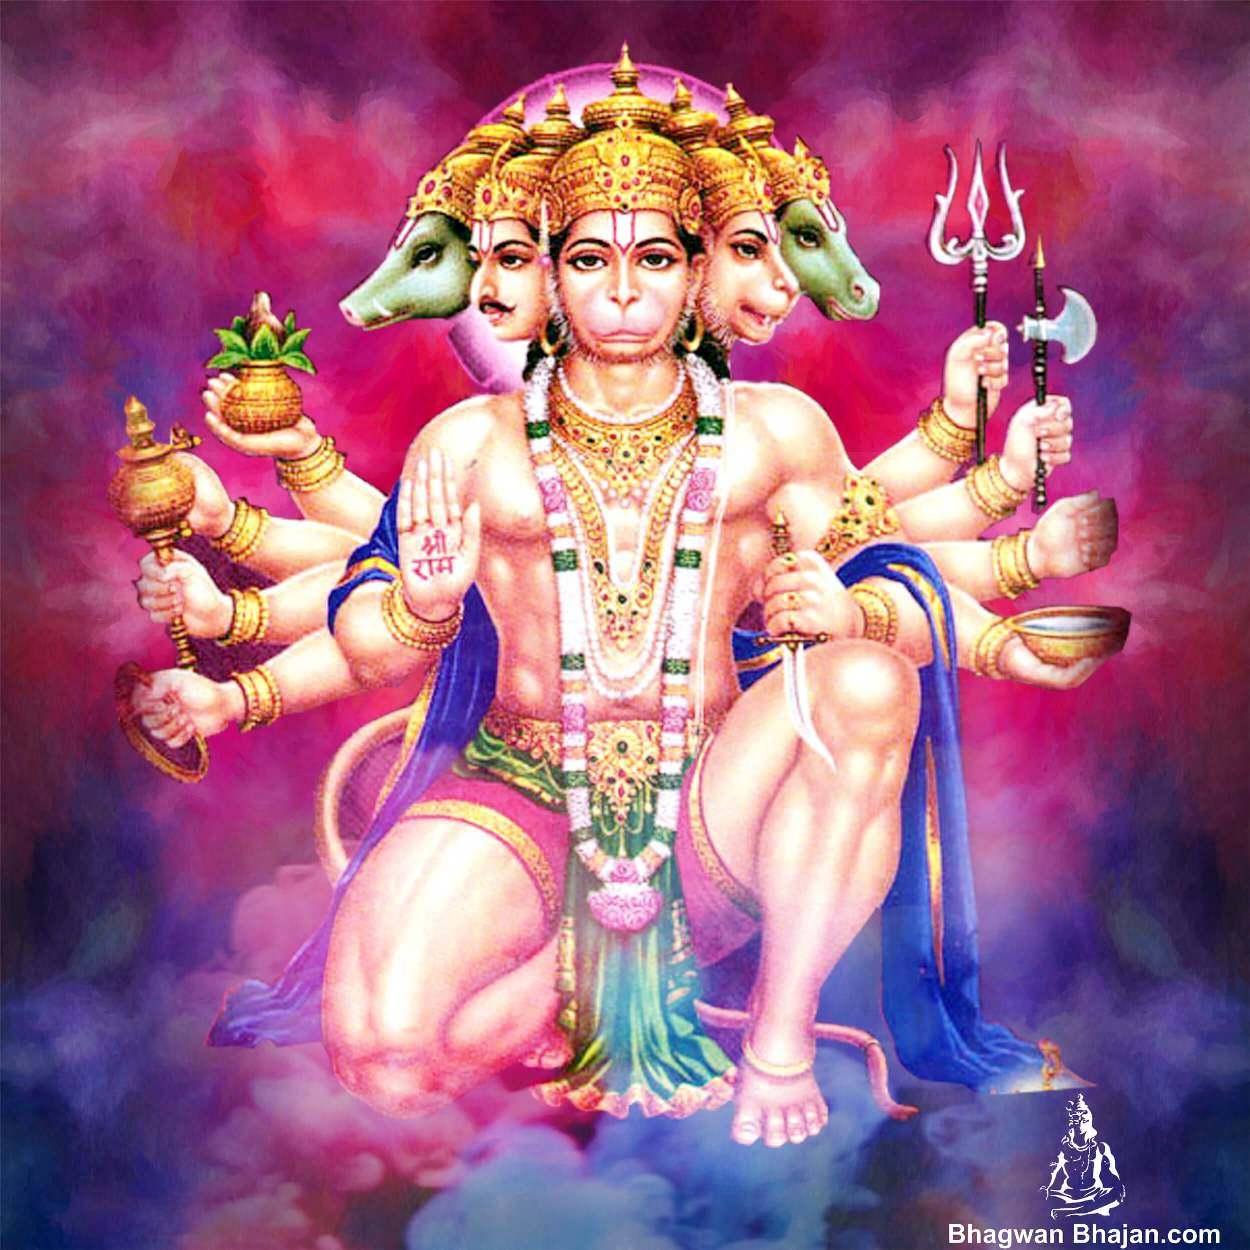 Download Free Hd Wallpapers Of Shree Hanuman Bajrangbali